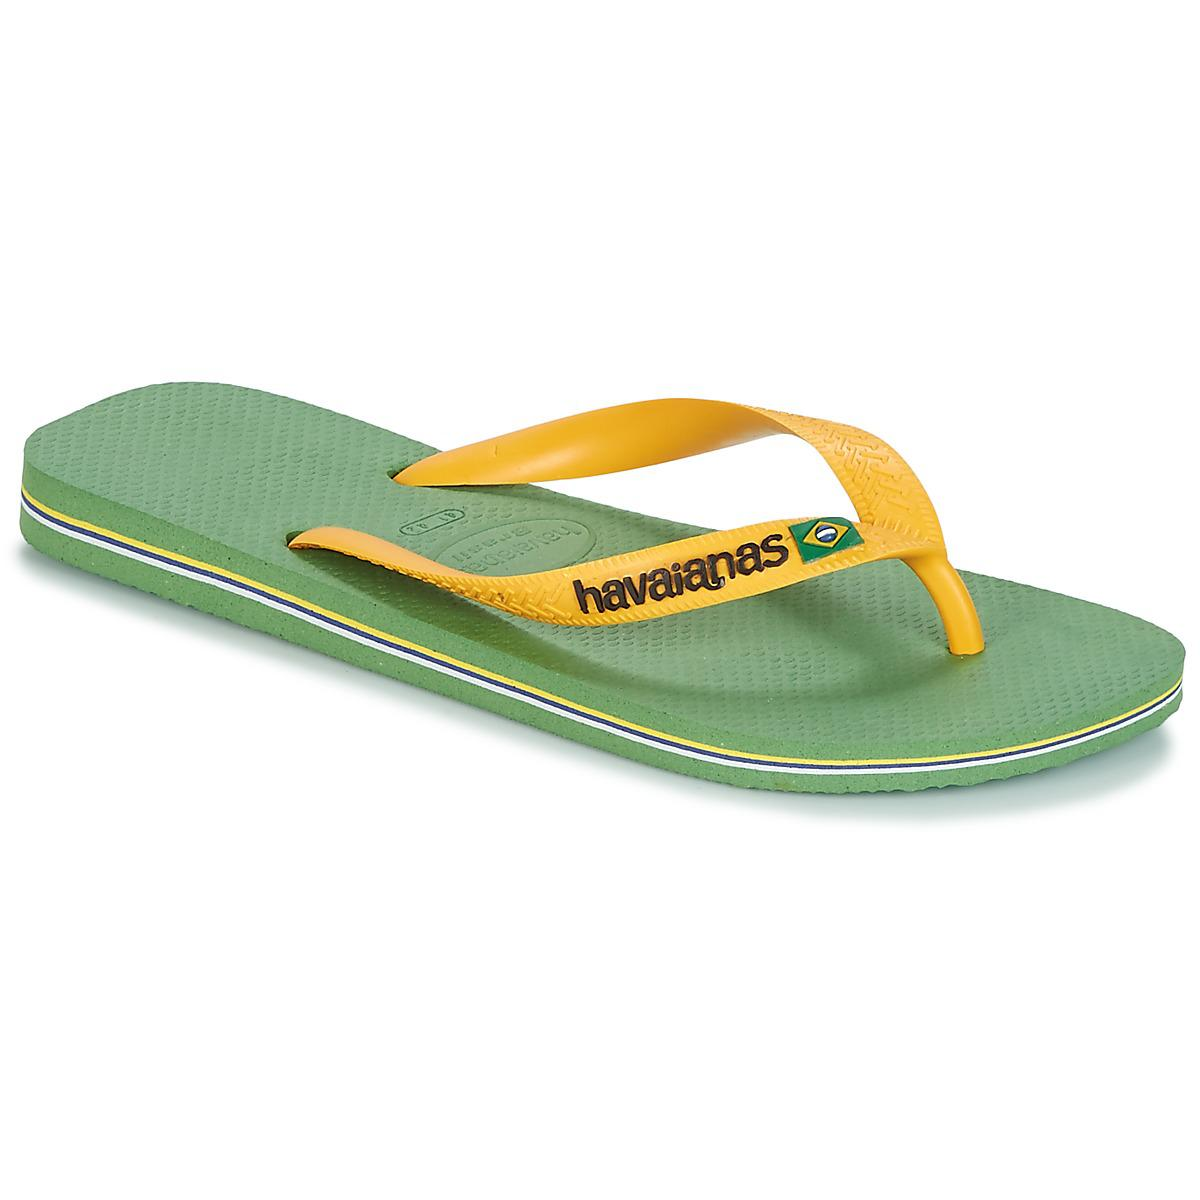 438bf528082b4 Havaianas - Brazil Logo Men s Flip Flops   Sandals (shoes) In Green for  Men. View fullscreen